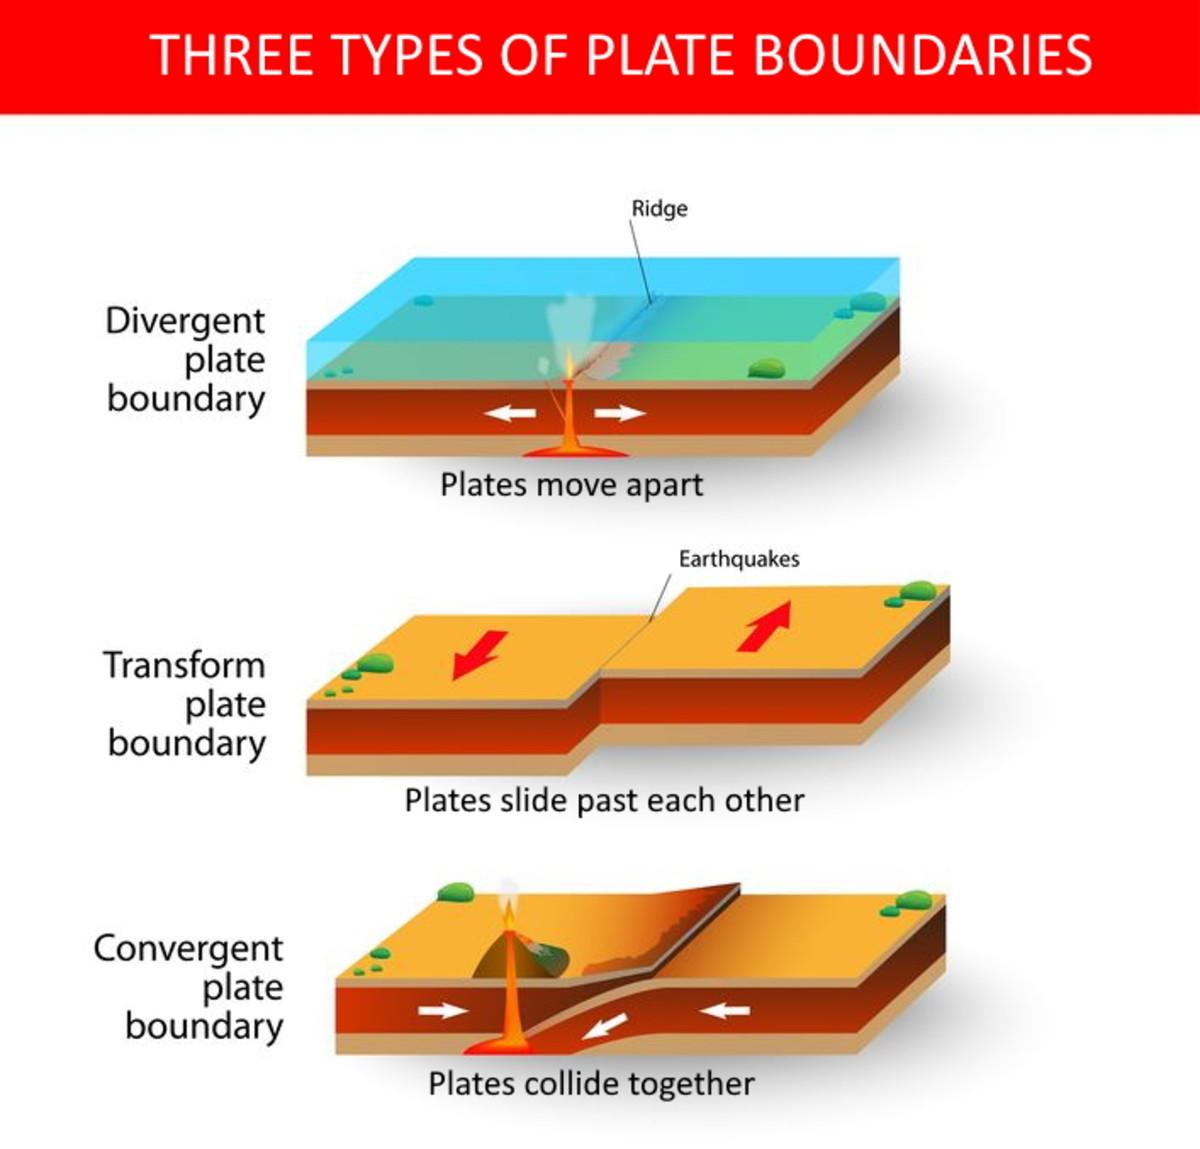 Divergent boundaries, convergent boundaries, and transform boundaries are the three types of plate boundaries.